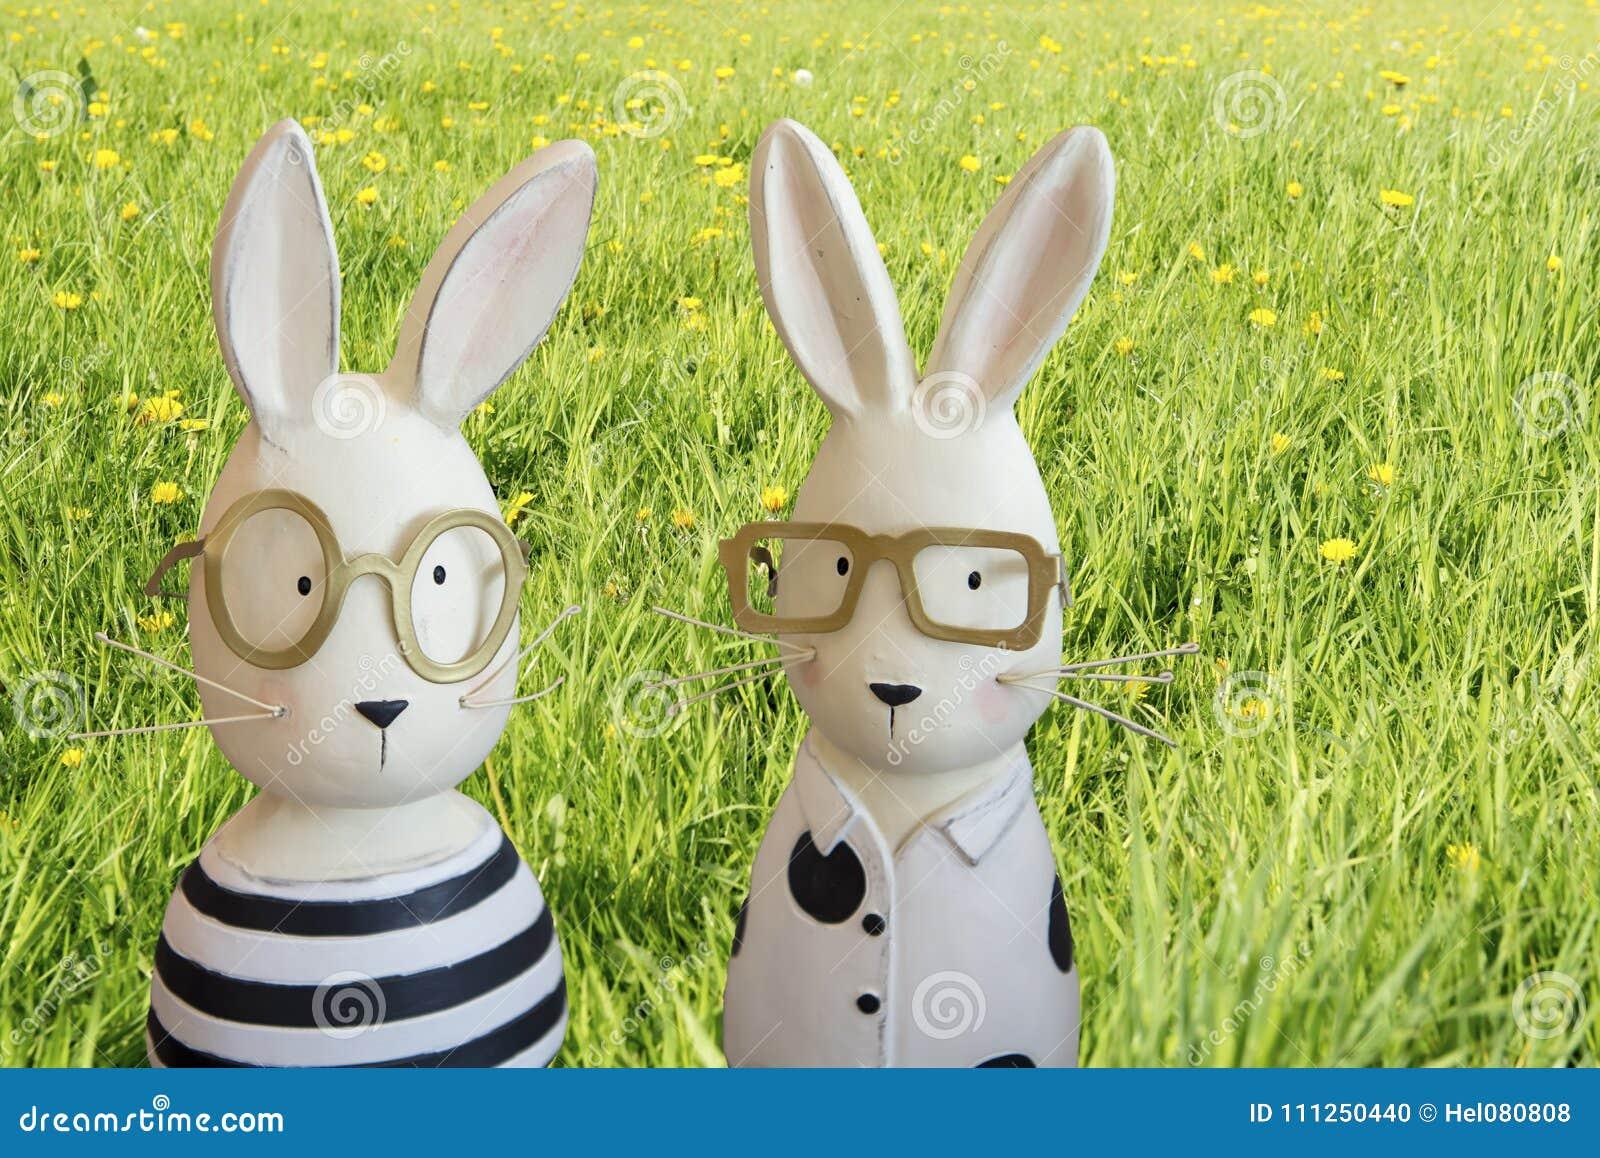 Happy easter - Easter bunnies in spring meadow